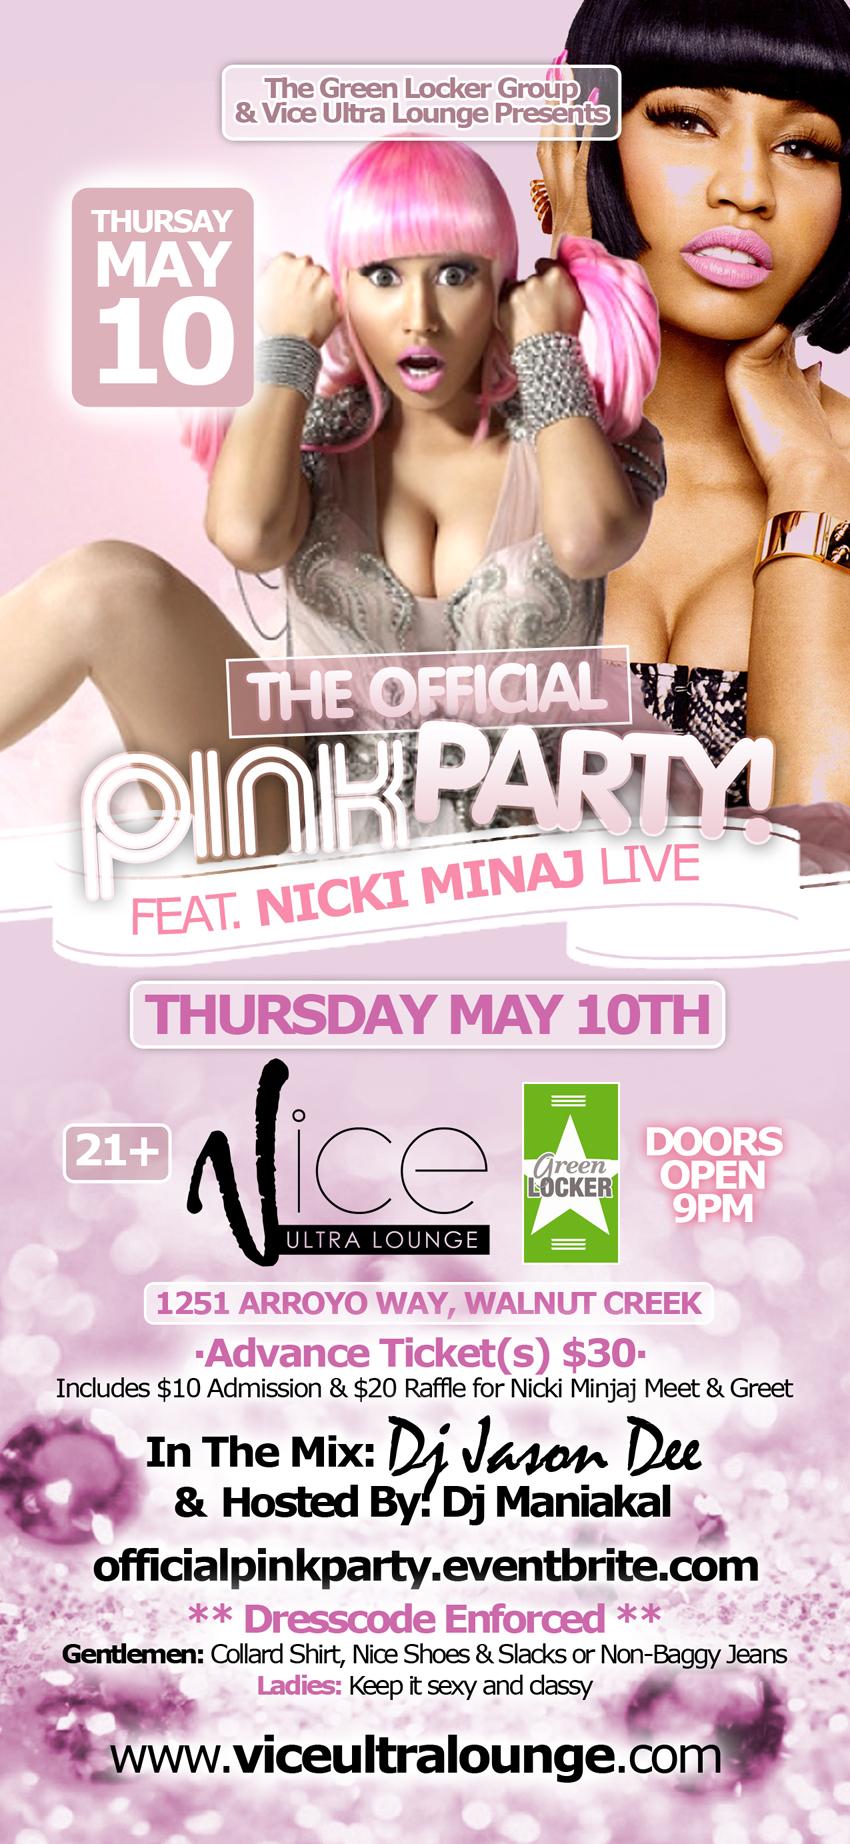 Official Pink Party feat. Nicki Minaj